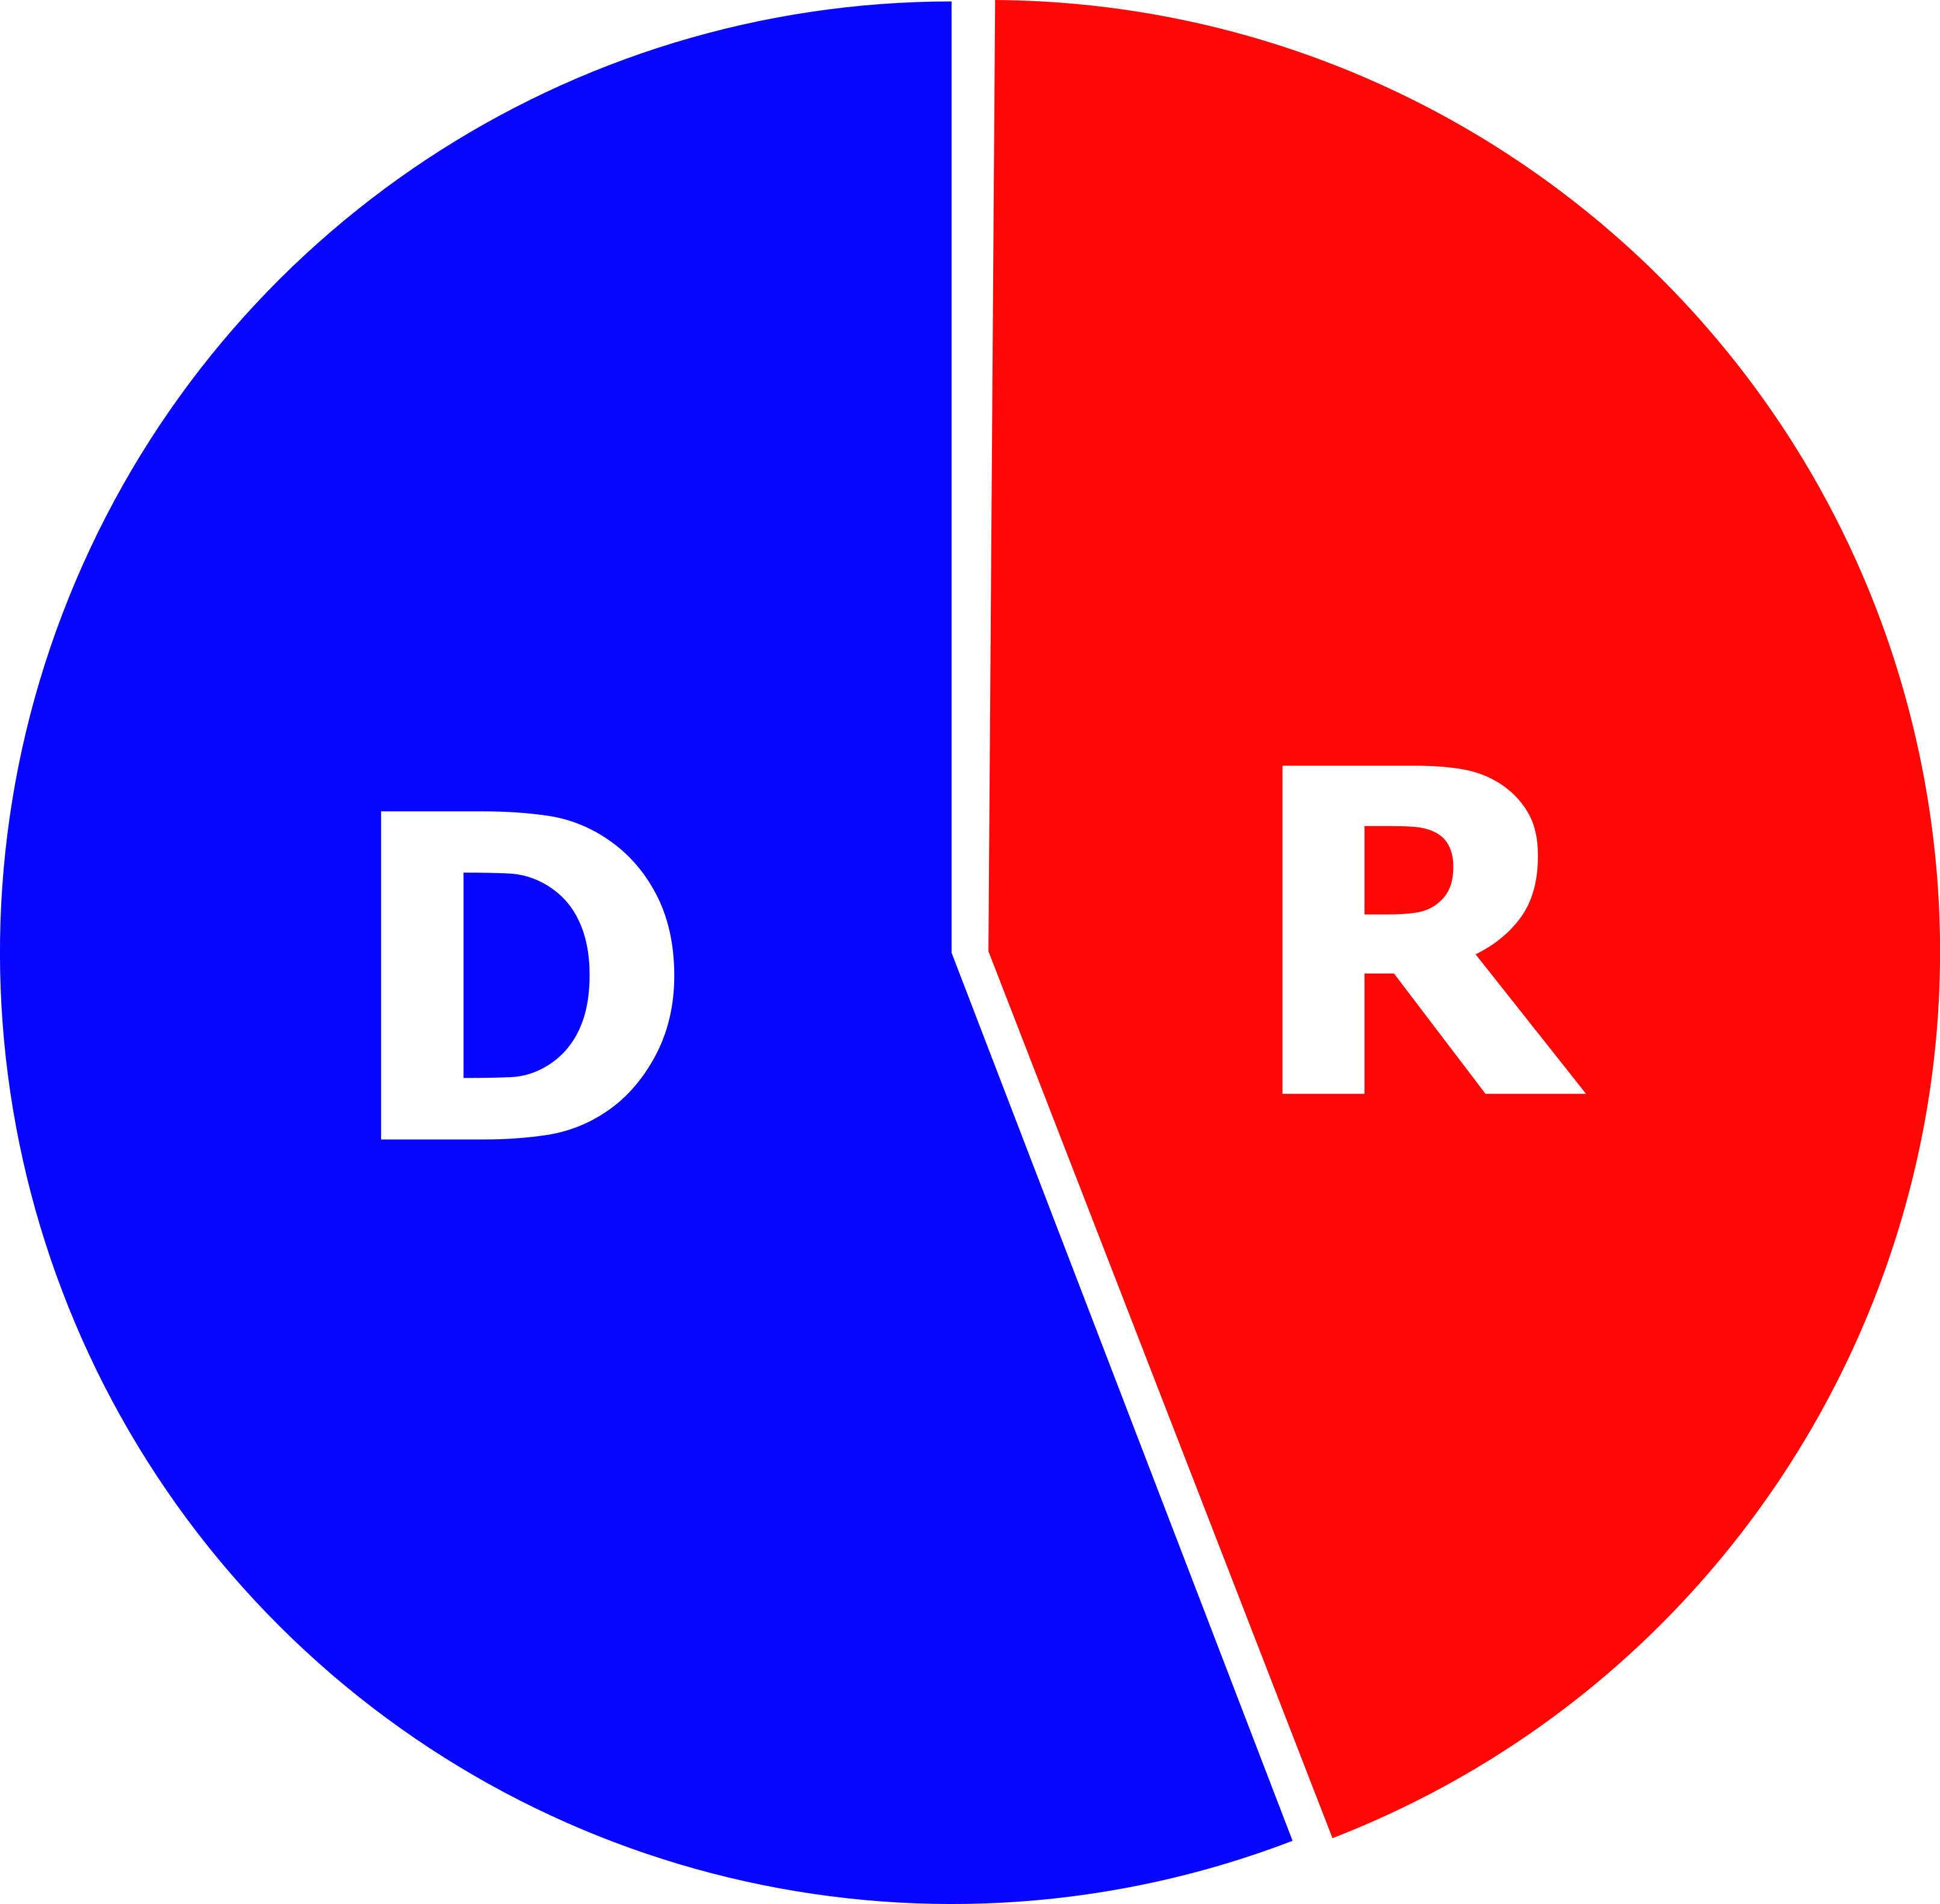 pie chart democrat republican